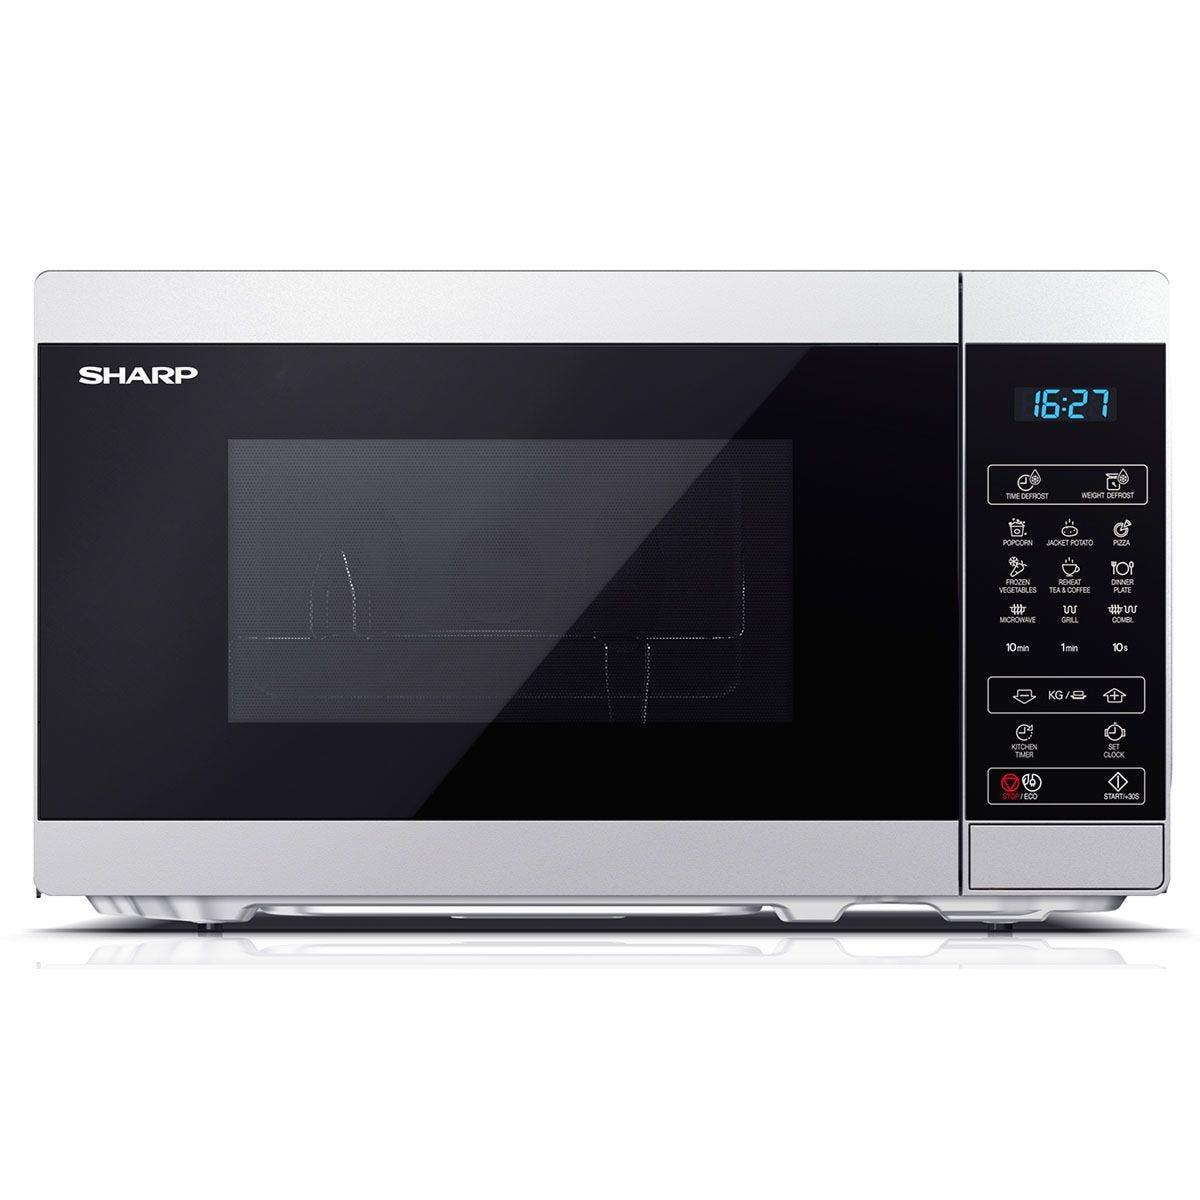 Sharp YC-MG02U-S 20L 800W Digital Touch Control Microwave with 1000W Grill - Silver